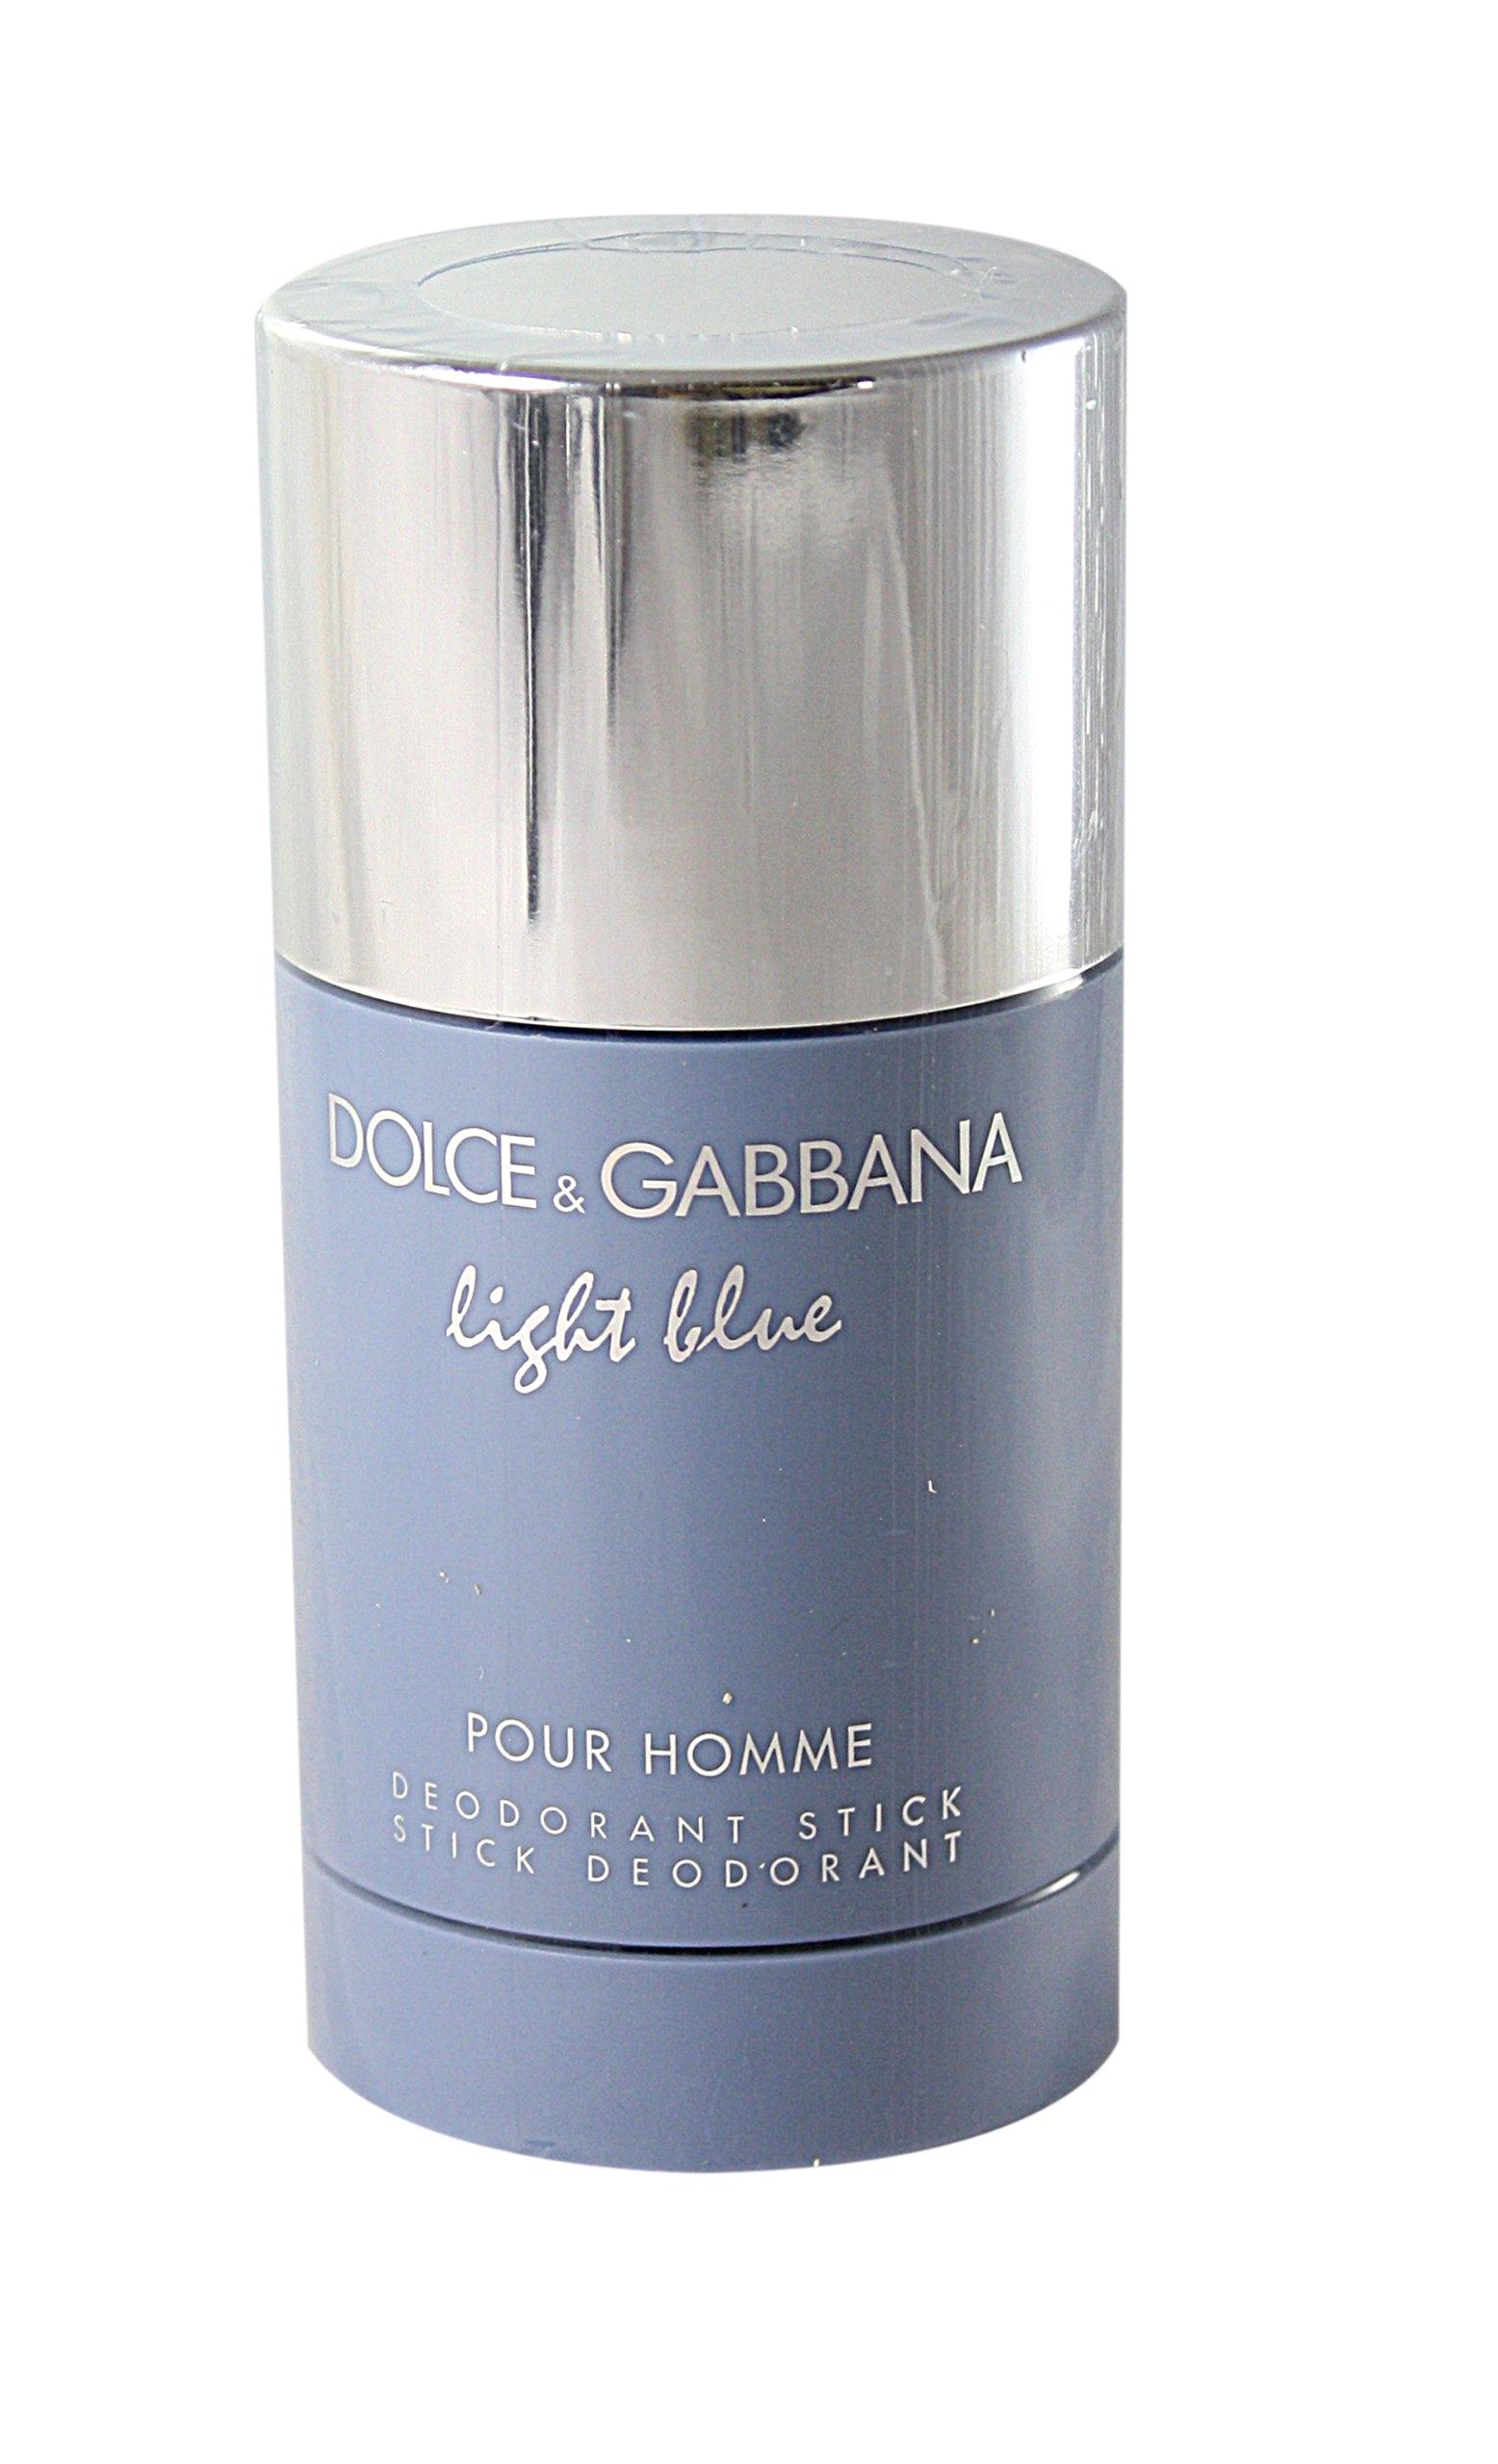 amazon com d g light blue by dolce gabbana for men deodorant stick 2 4 ounces deodorants and antiperspirants beauty